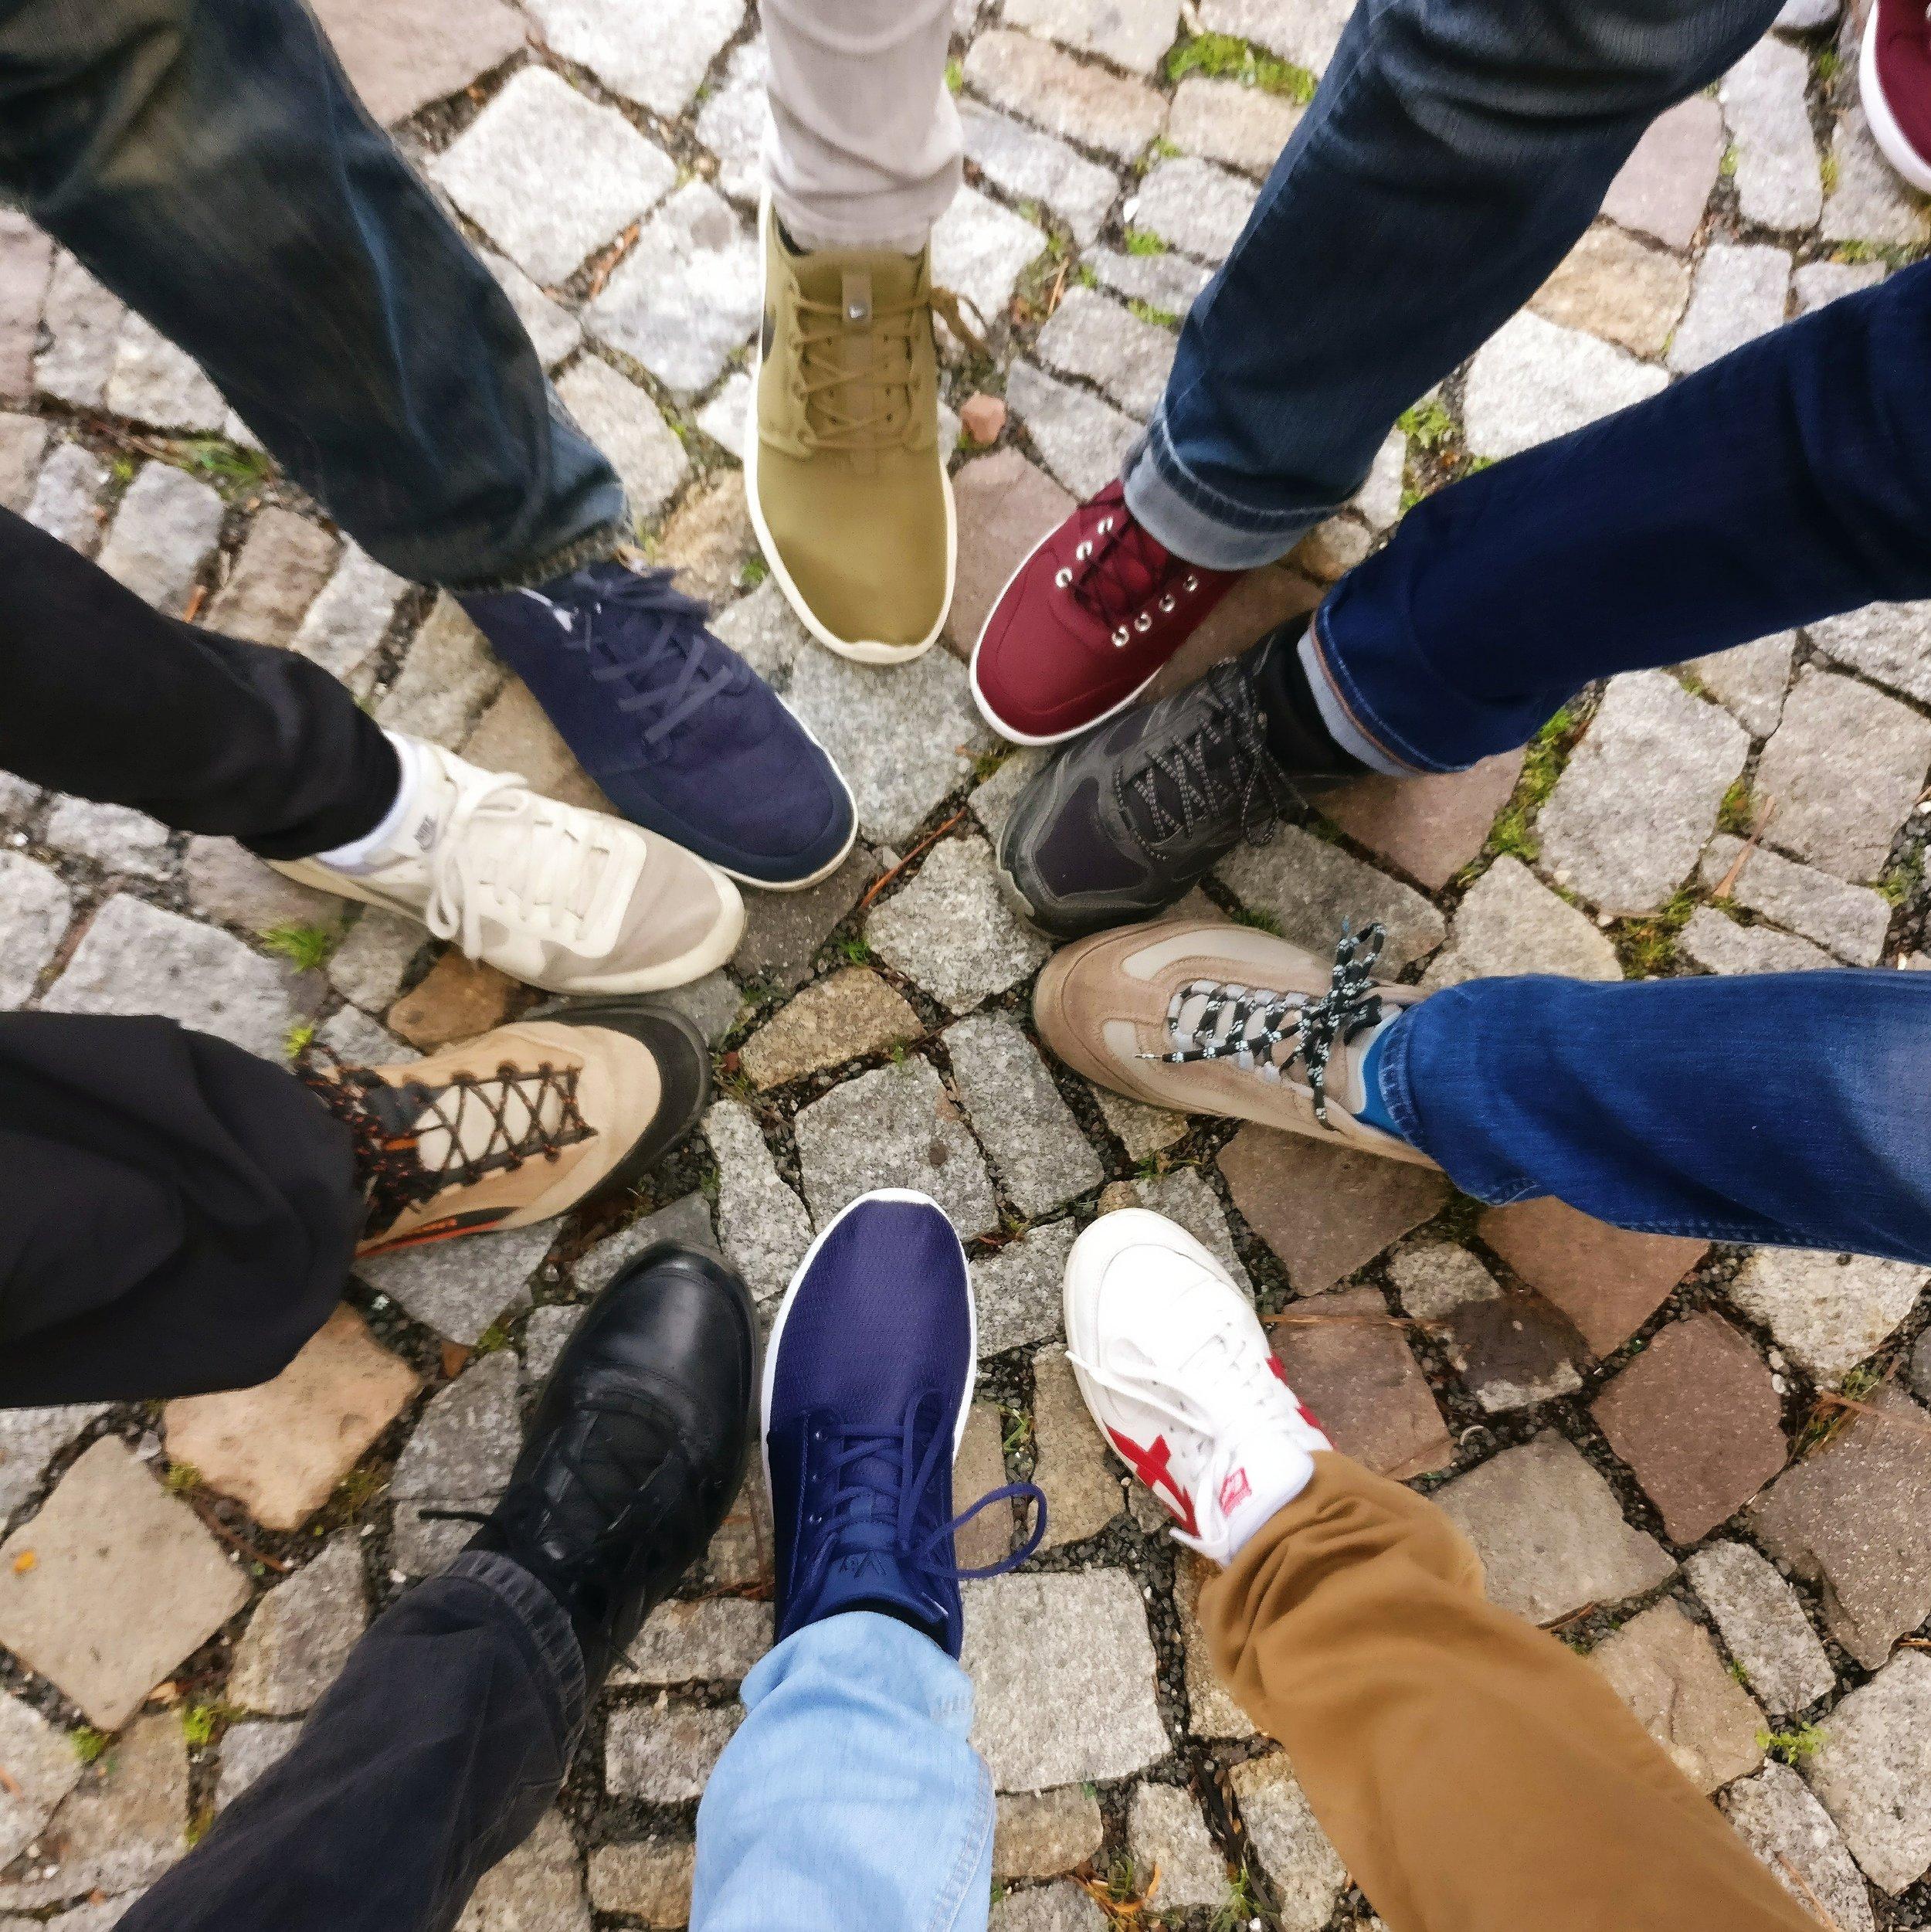 brand-trademark-cobblestones-community-609771.jpg